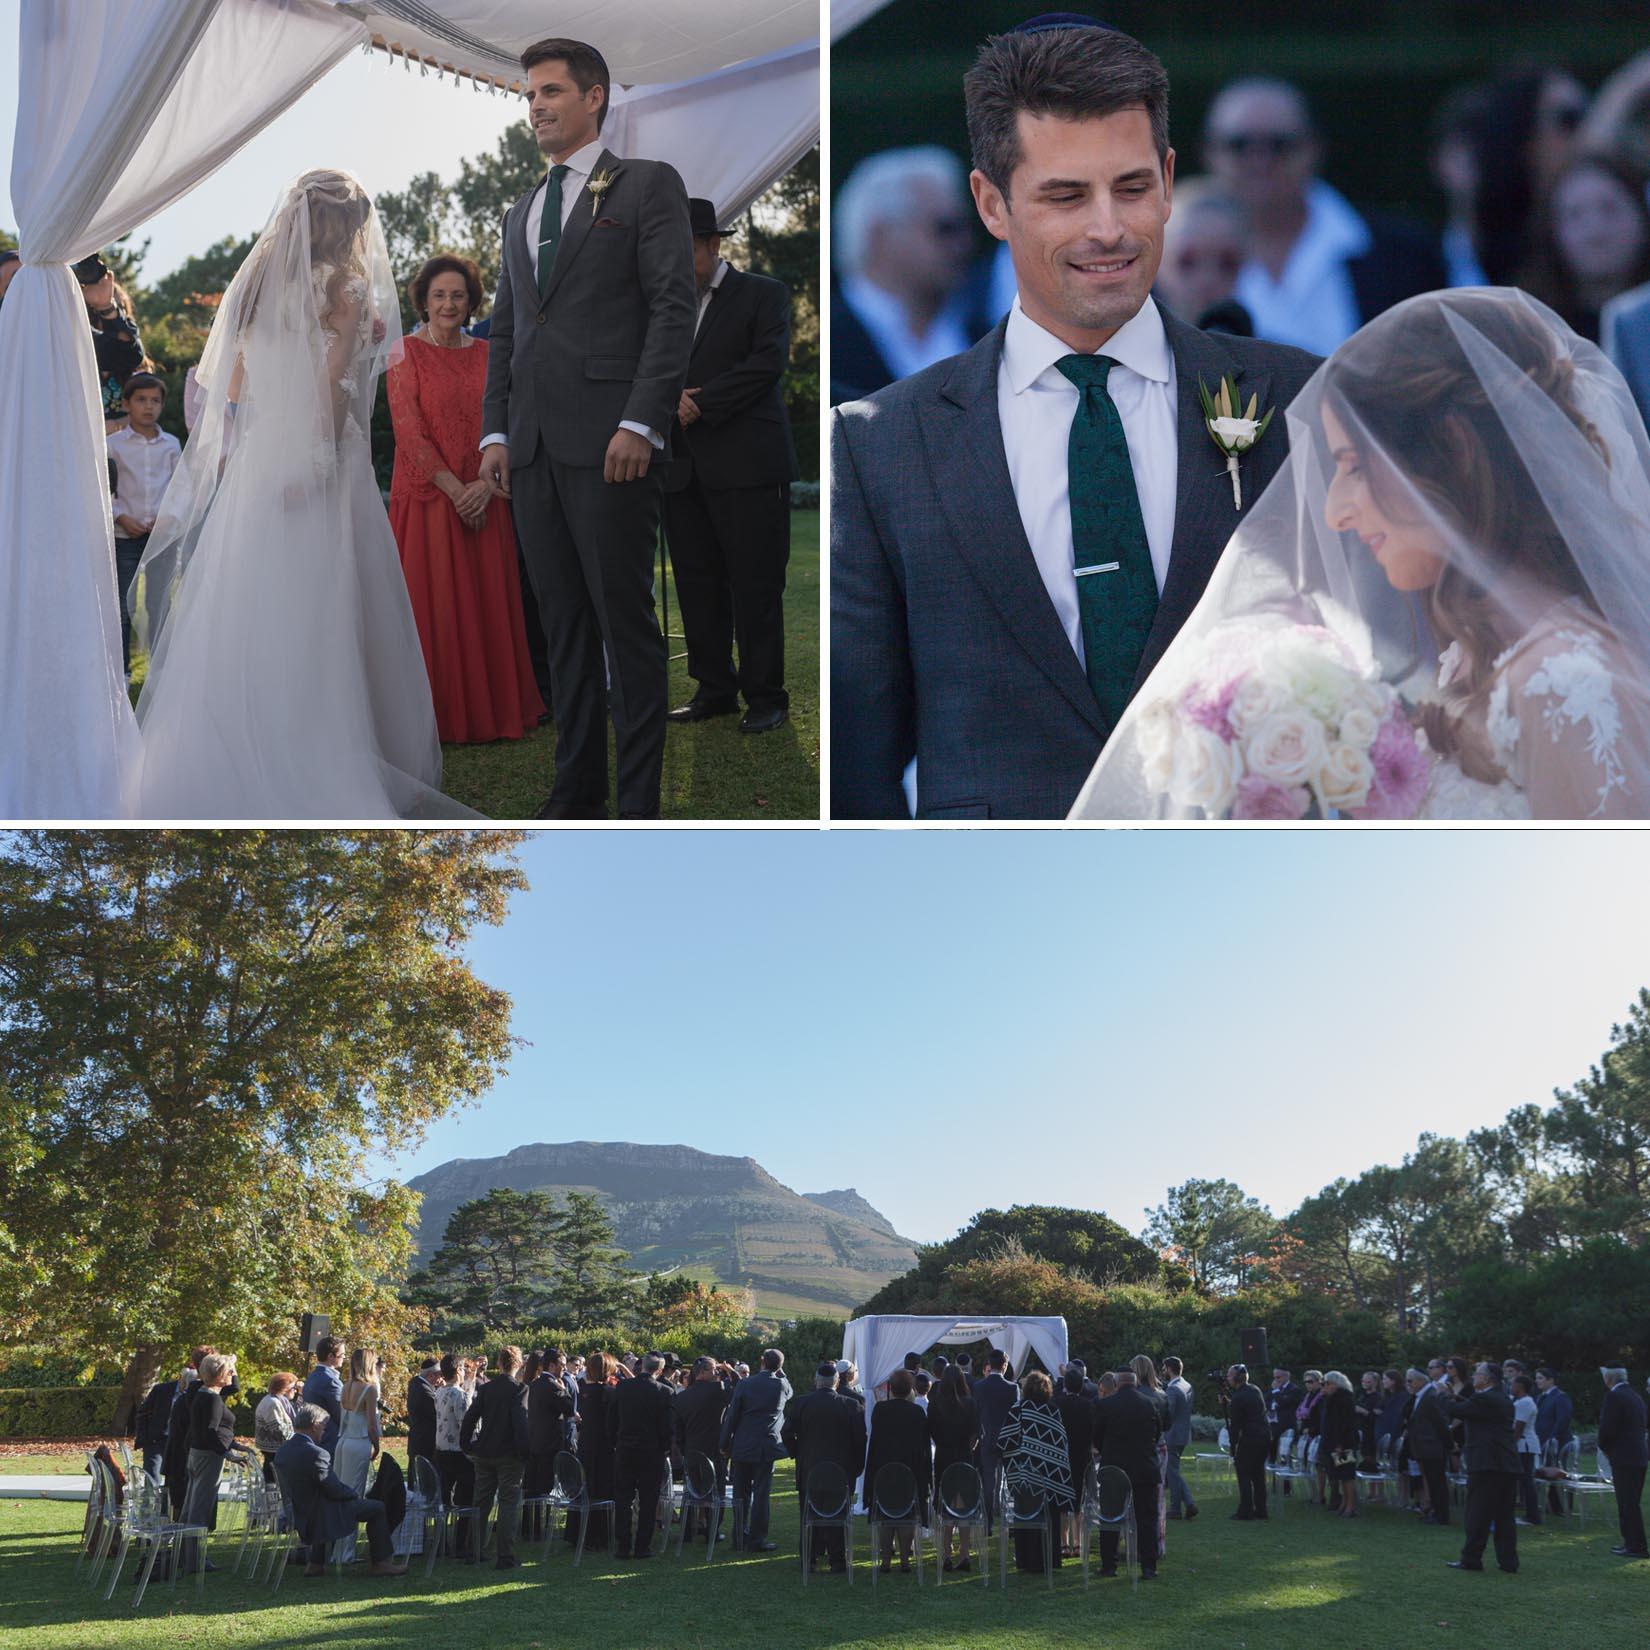 Leon_&_Martine's_Wedding_Photographs_17th_April_2019_@johnhenryweddingphoto_Low_Resolution_Web-244_1.jpg